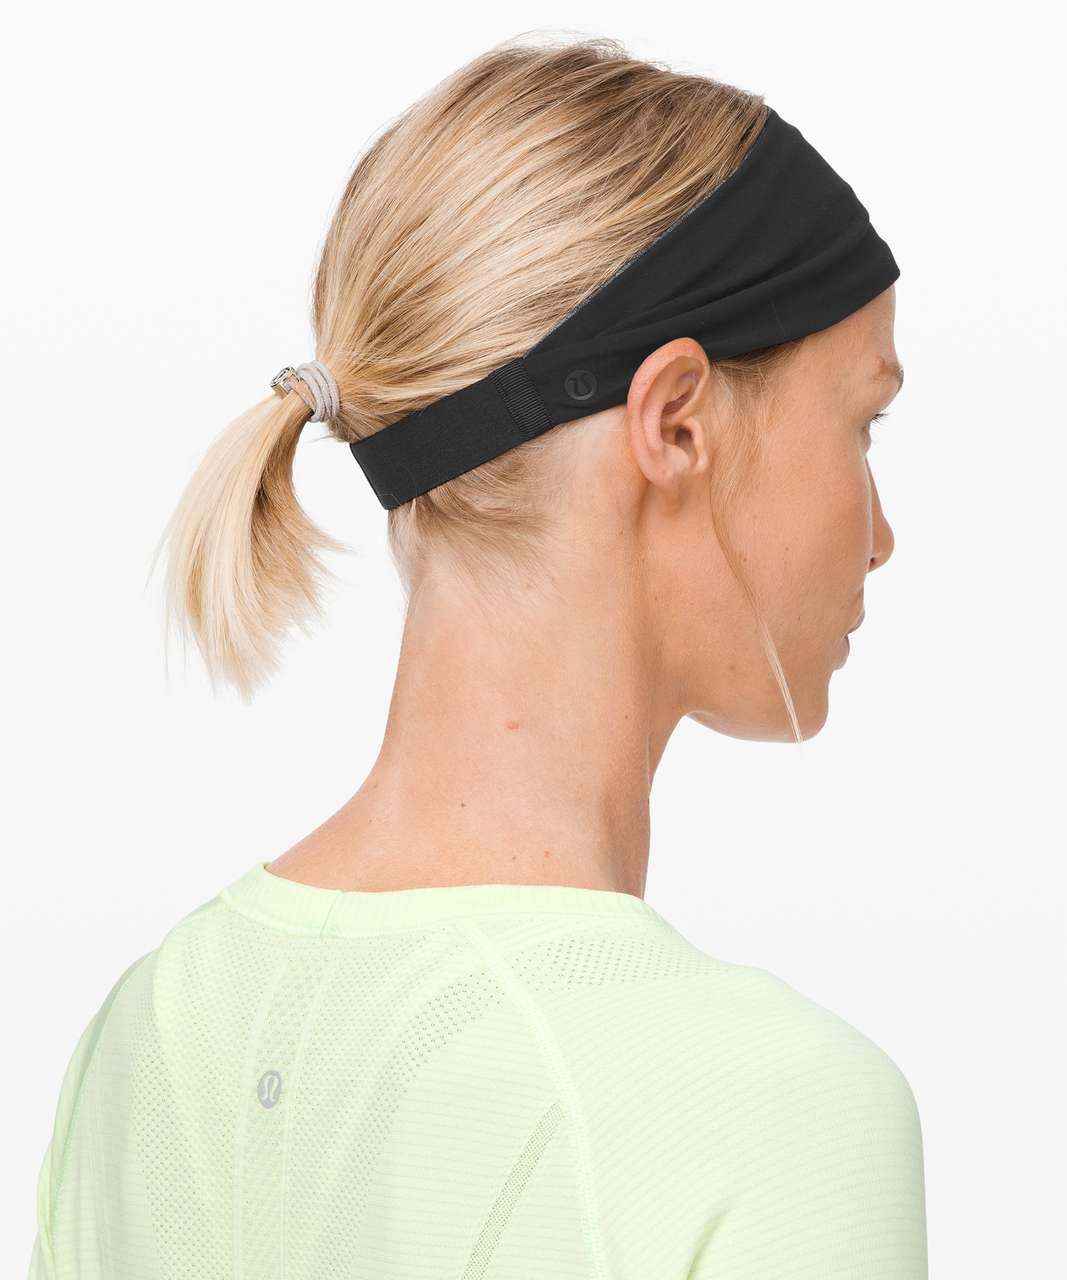 Lululemon Fringe Fighter Headband - Black / Heathered Black (Third Release)